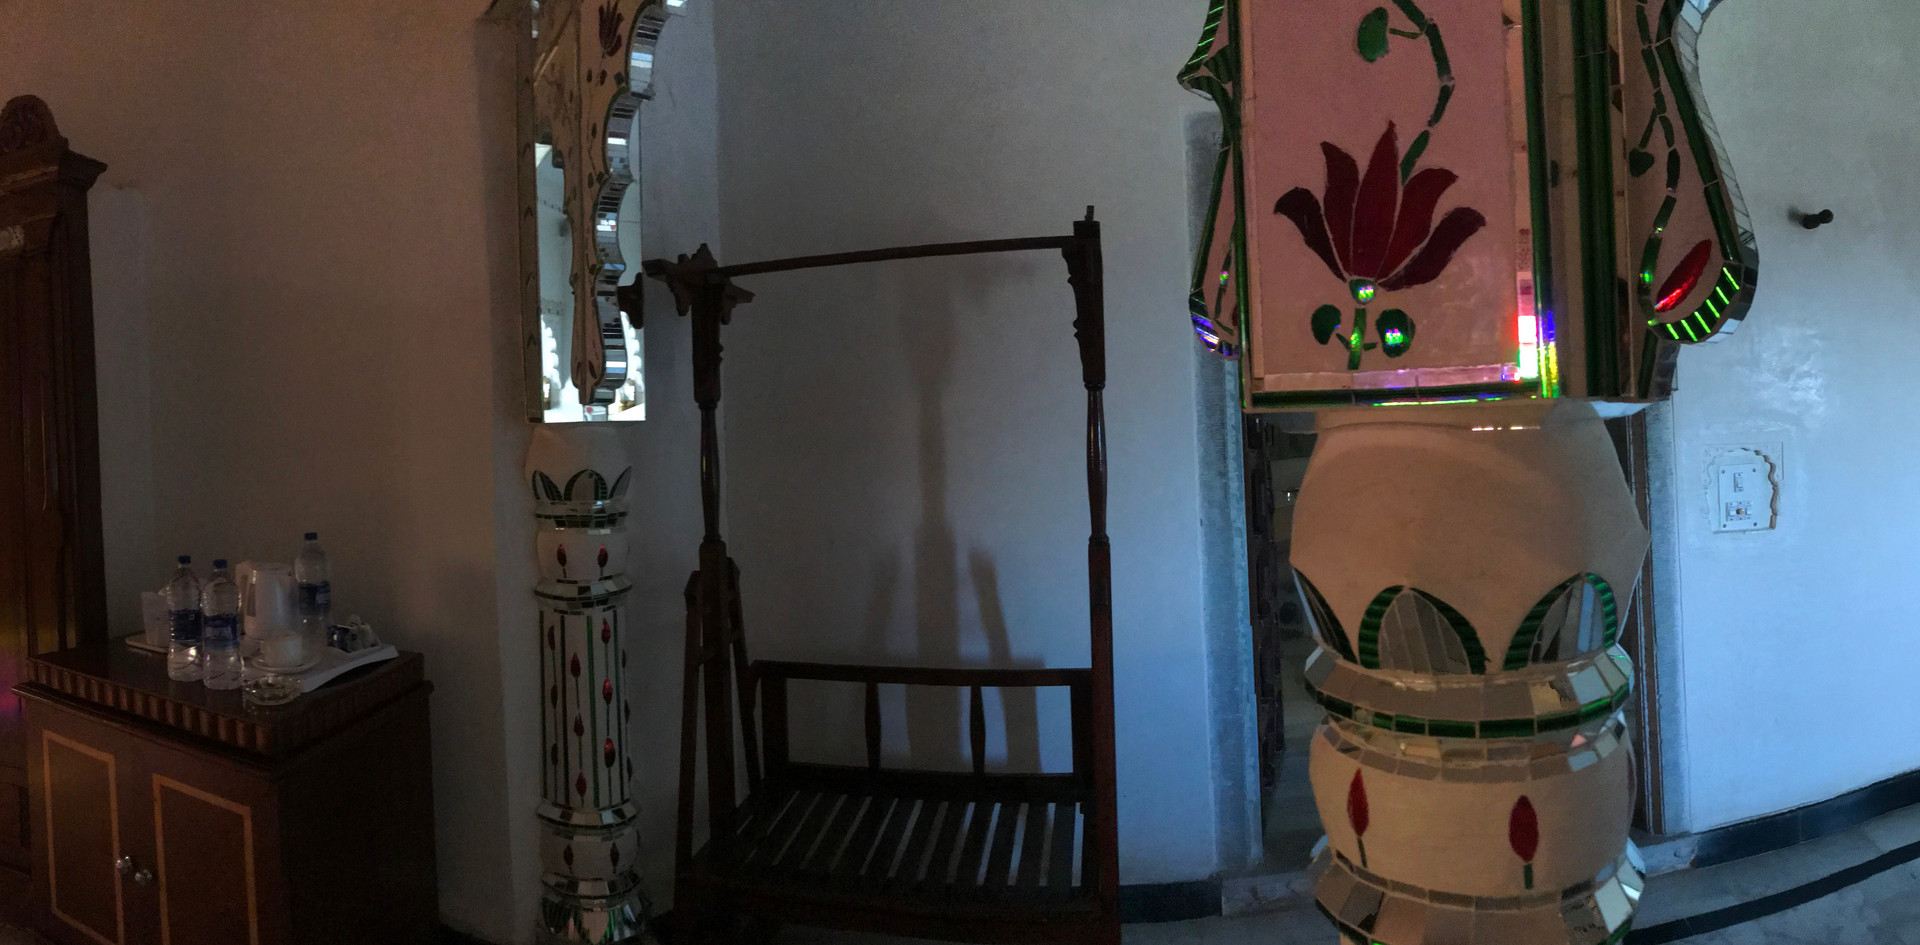 PANORAMA-RAJASTHAN-HERITAGE-COLOURED-WIN